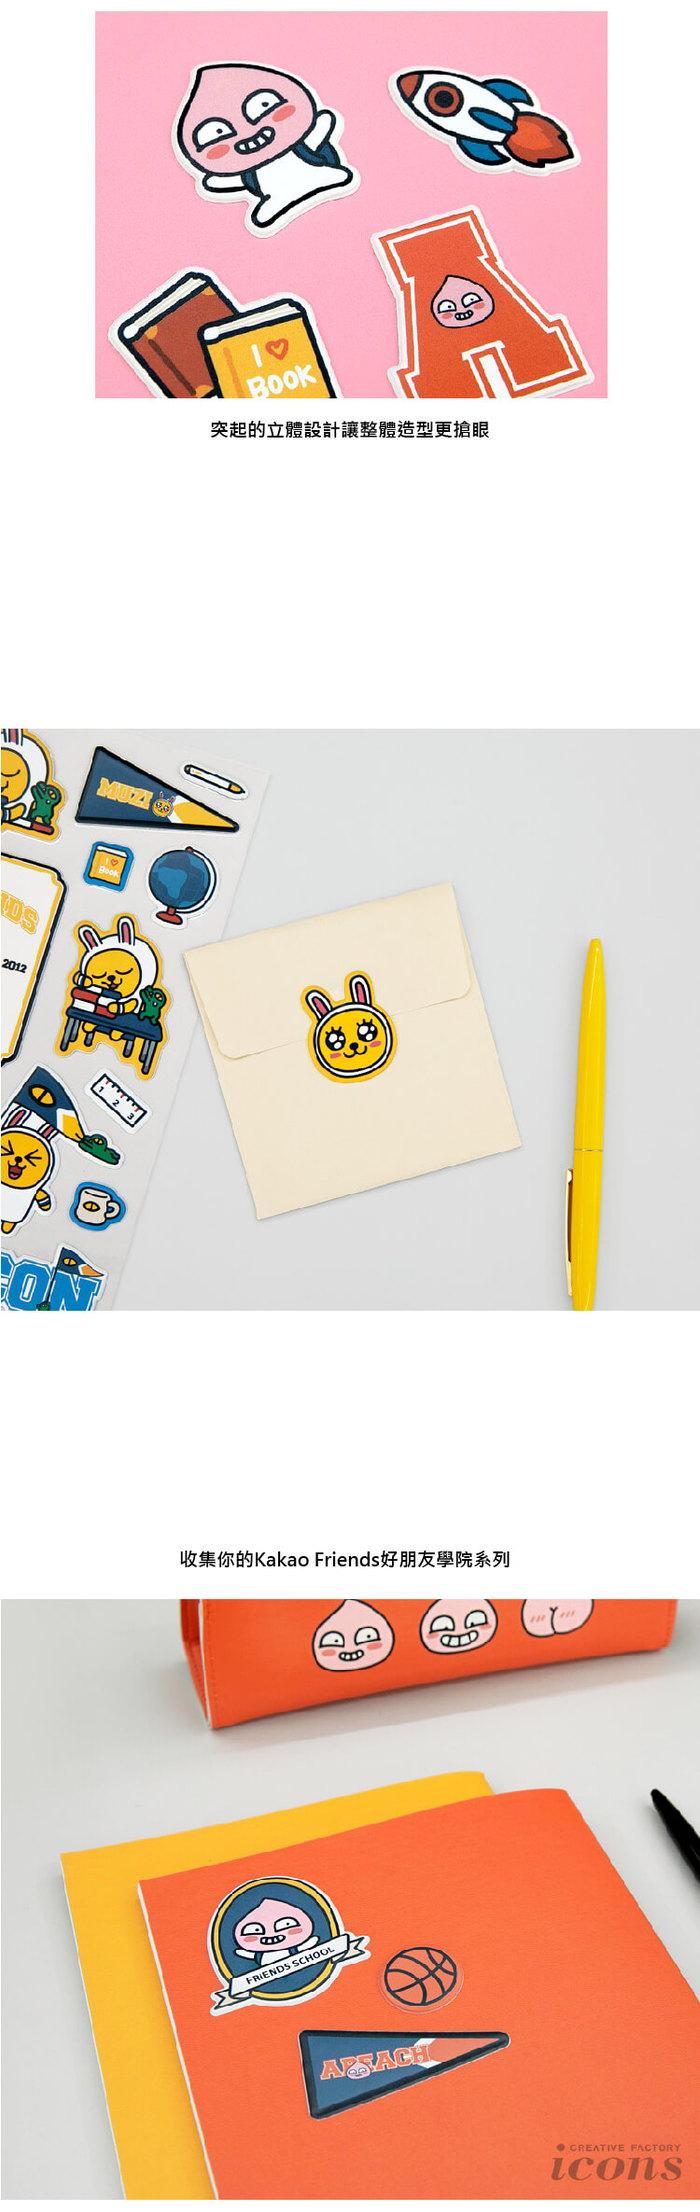 Kakao Friends|好朋友學院系列 萬用磁鐵貼 立體萬用貼紙 二入組